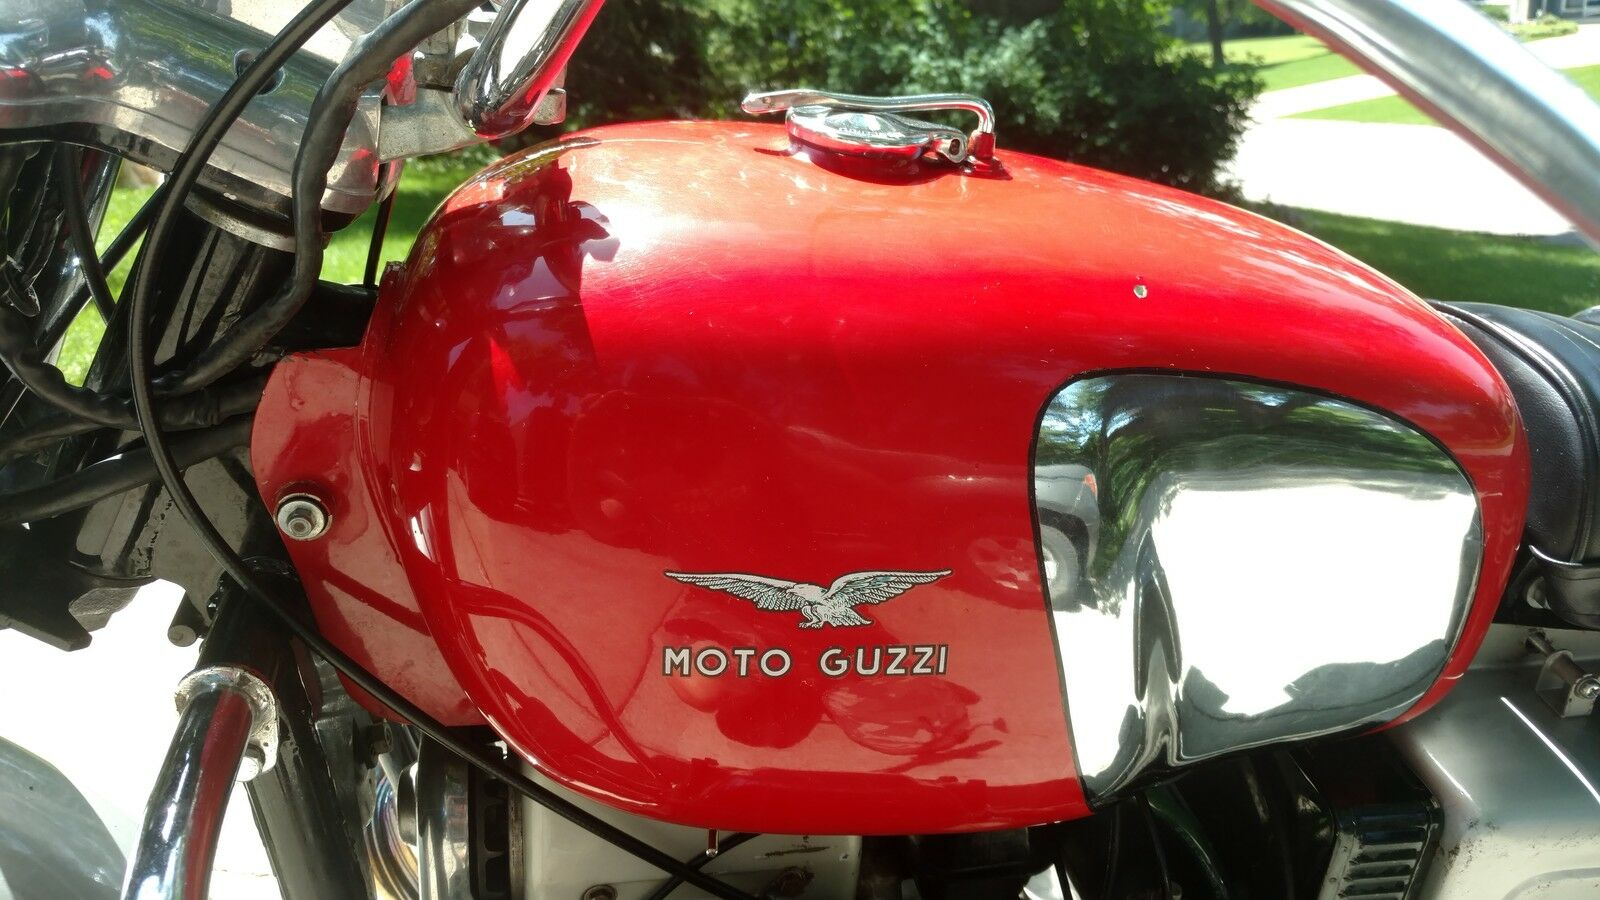 Guzzi Moto